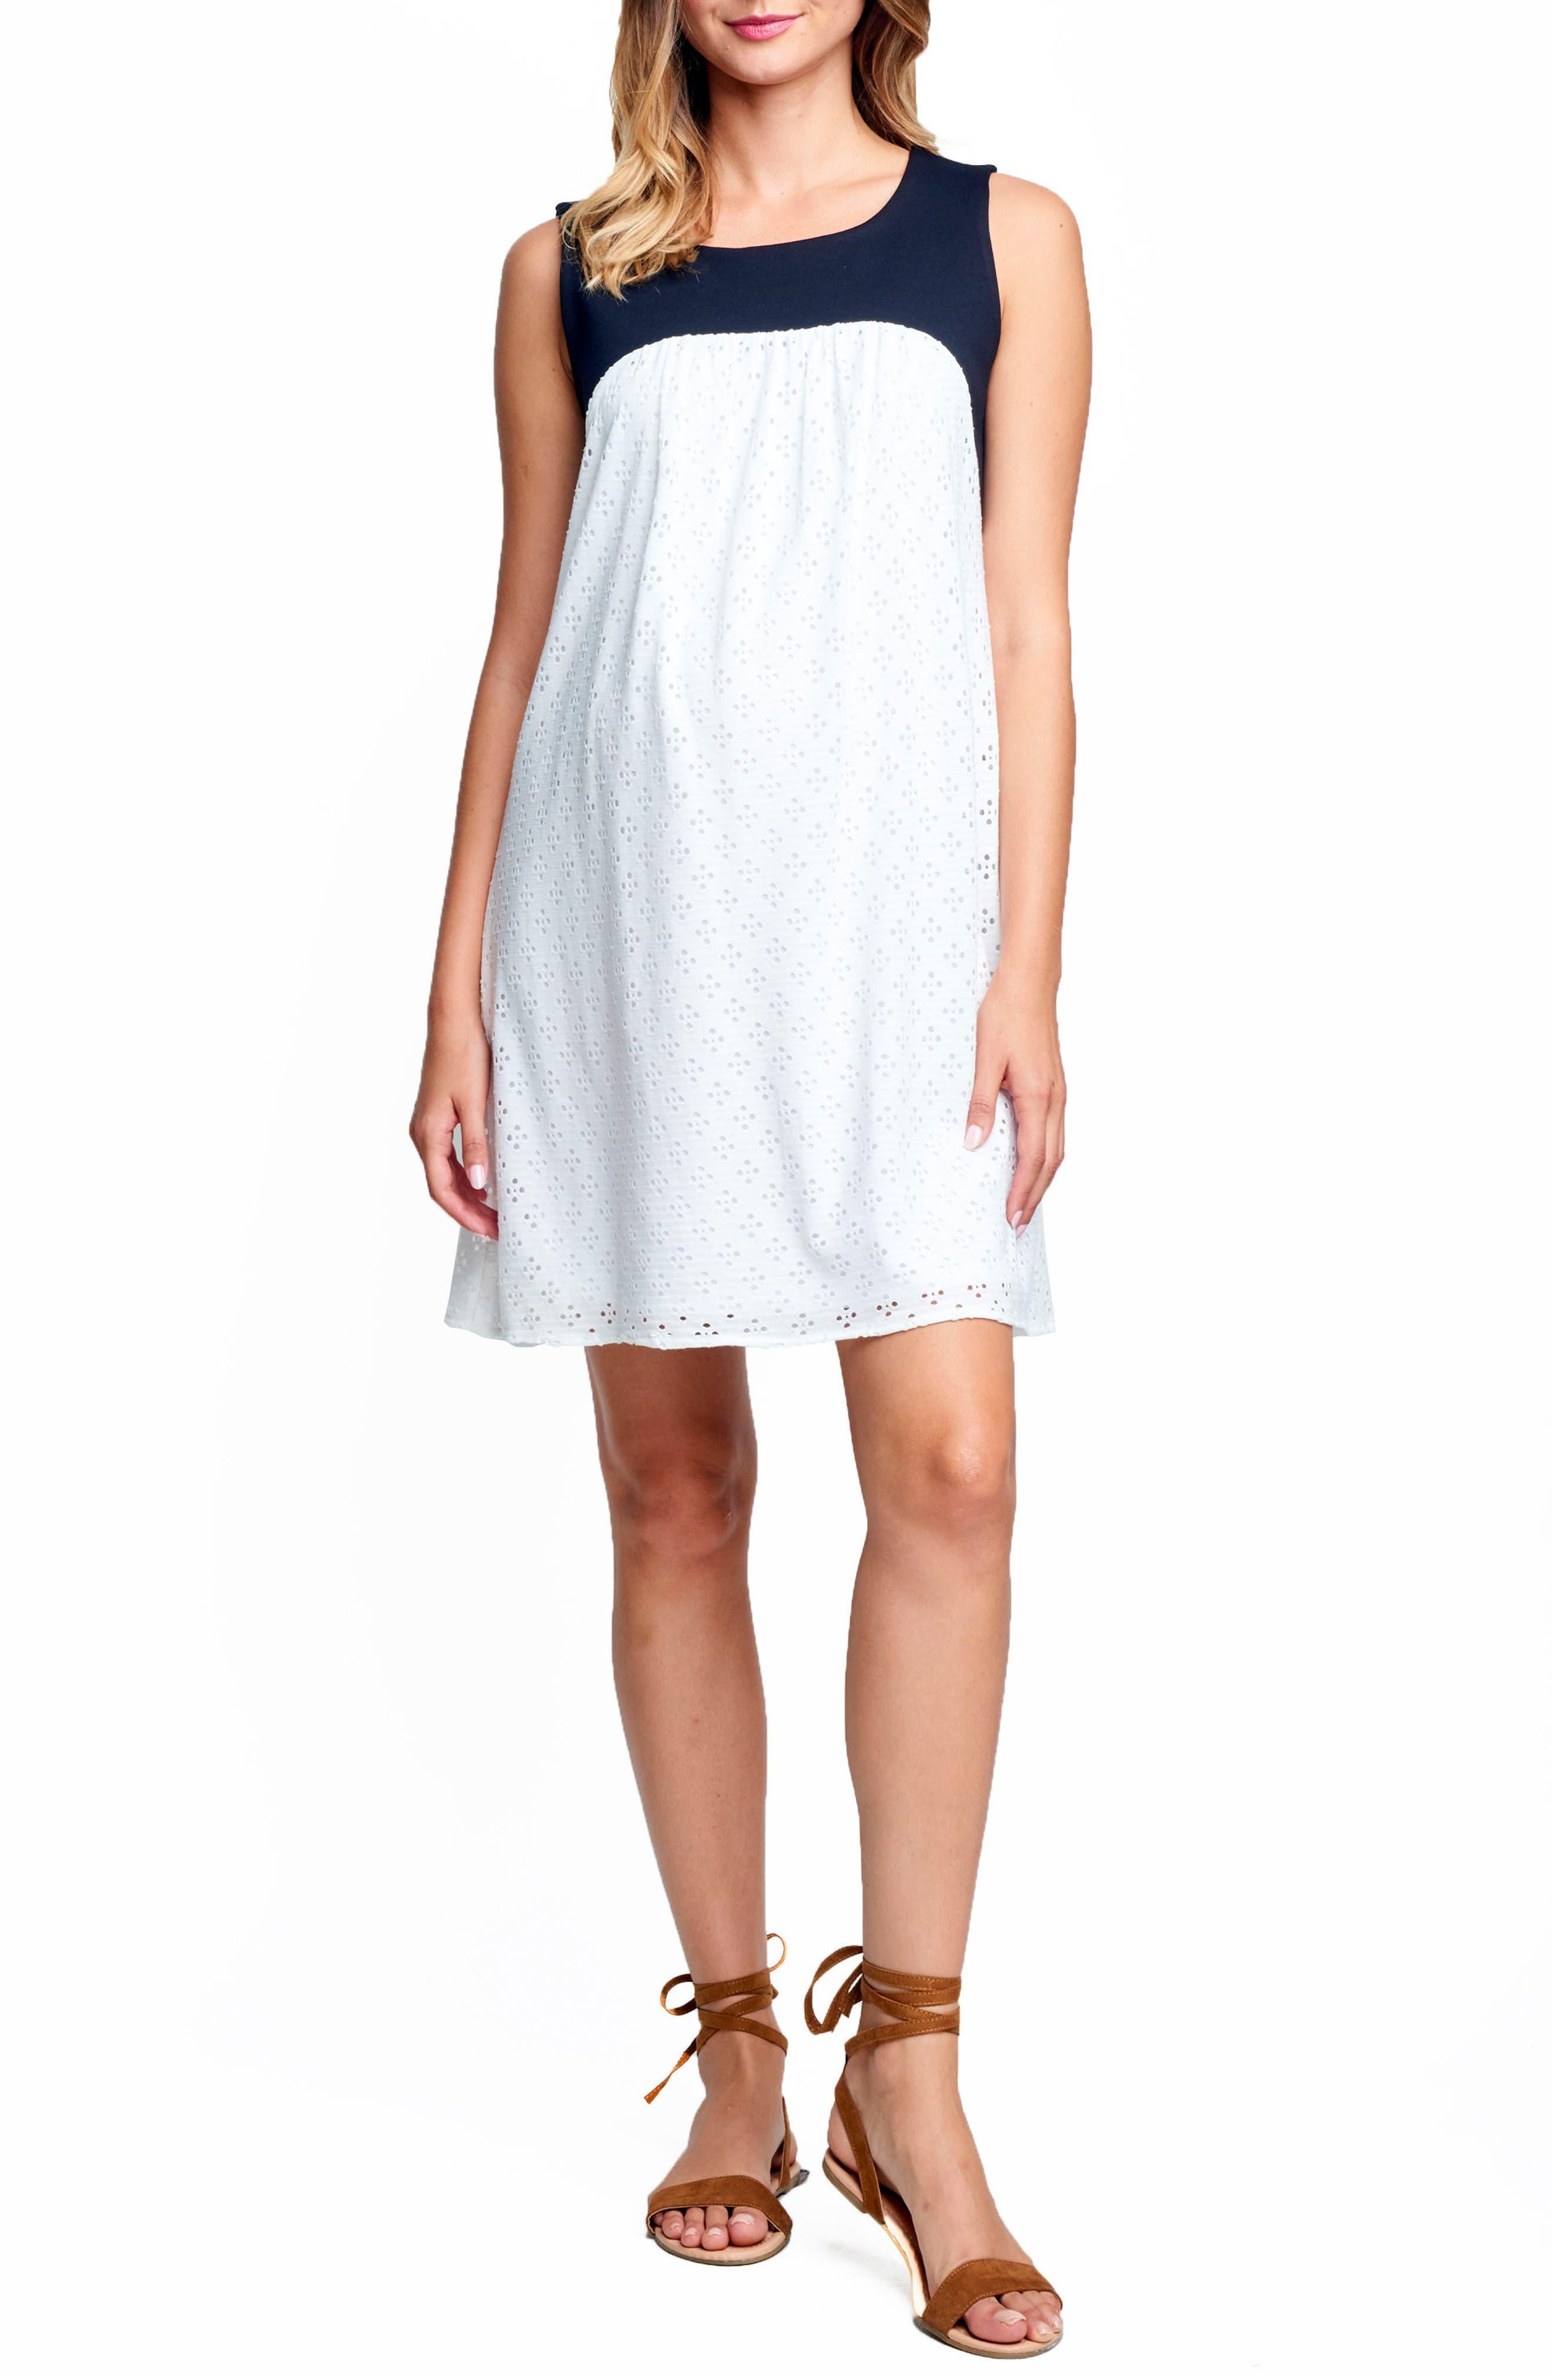 Maternal America Babydoll Maternity Dress, White